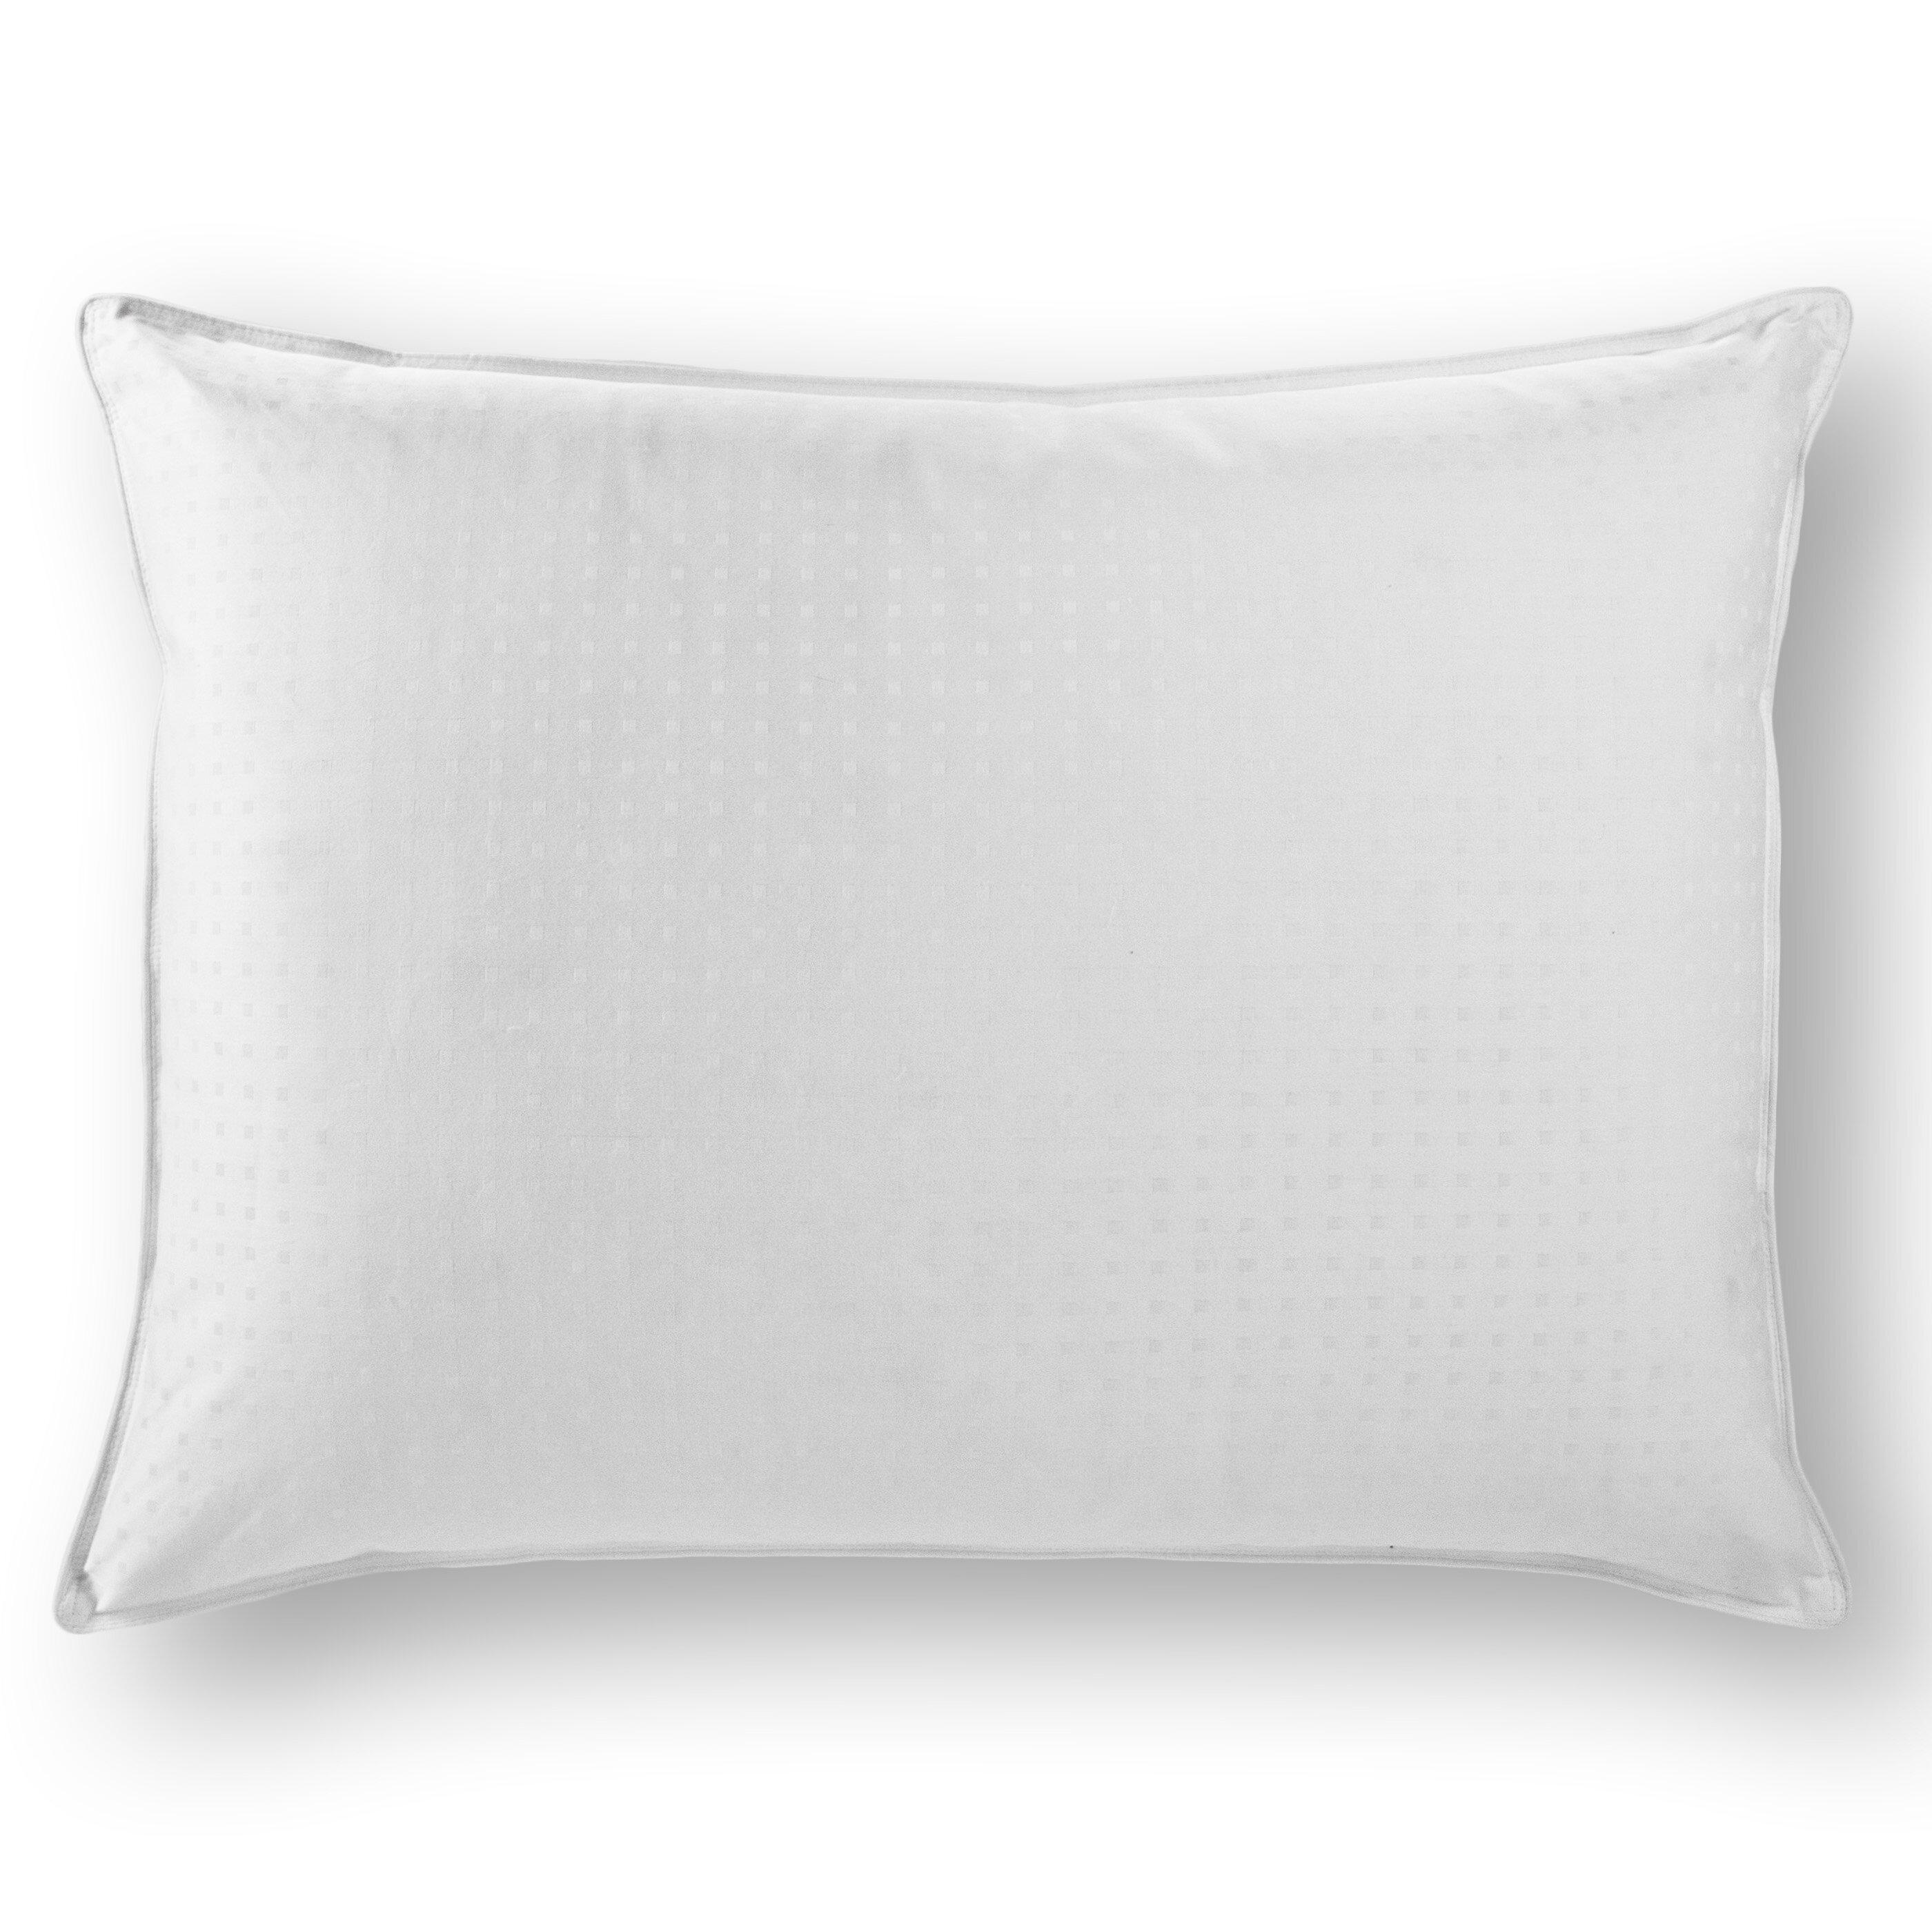 St James Home Five Star Goose Down Pillow Reviews Wayfair